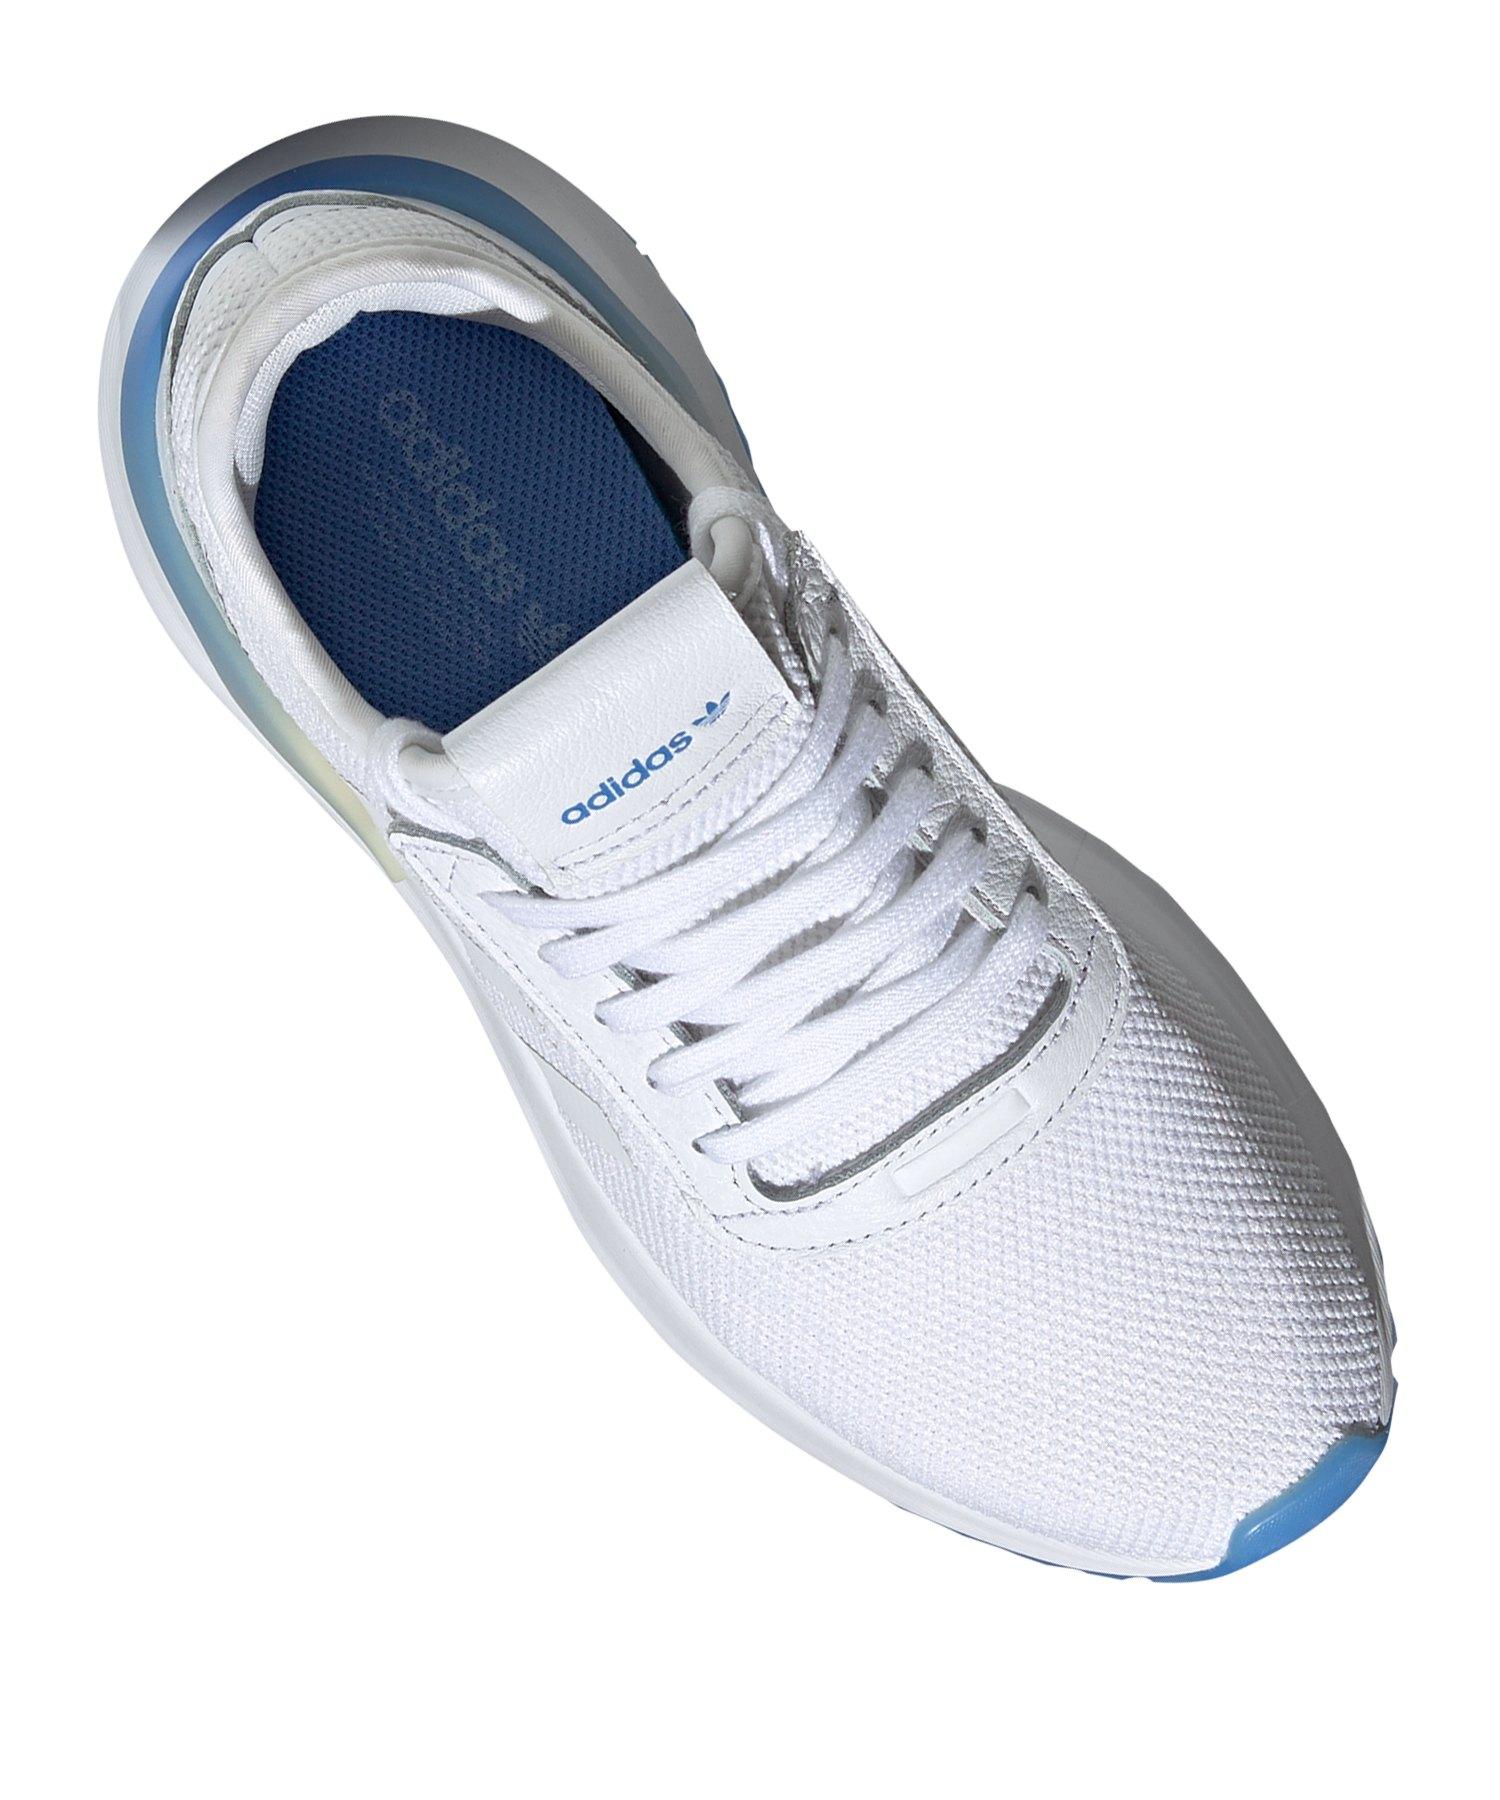 adidas Originals U_Path X Sneaker Damen Weiss Blau